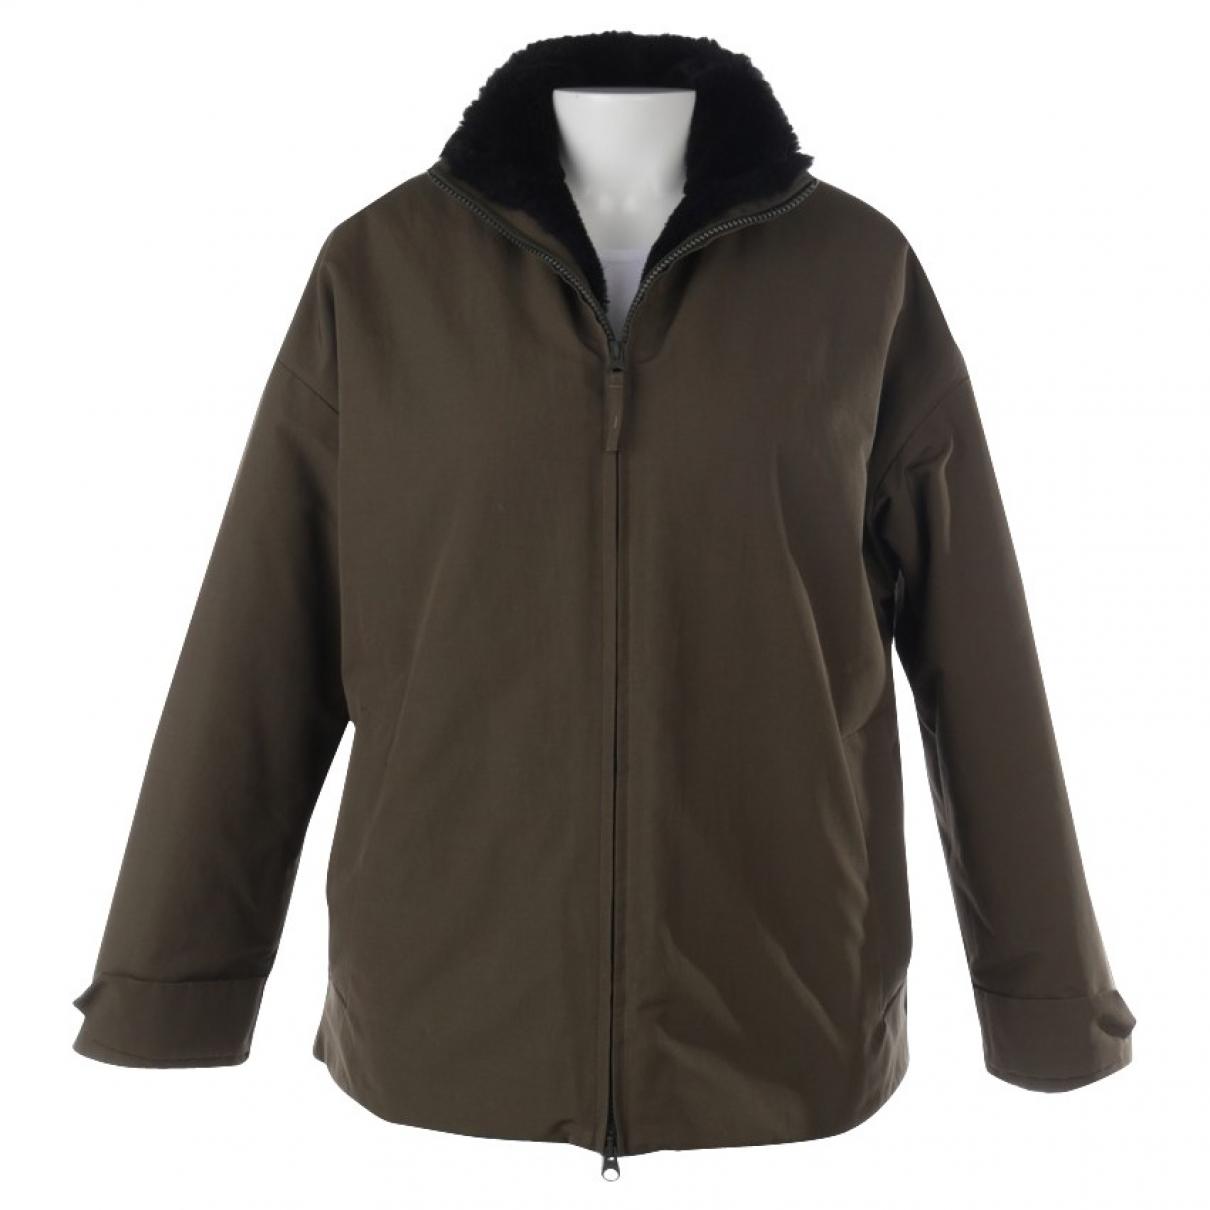 Aspesi \N Green Cotton jacket for Women S International